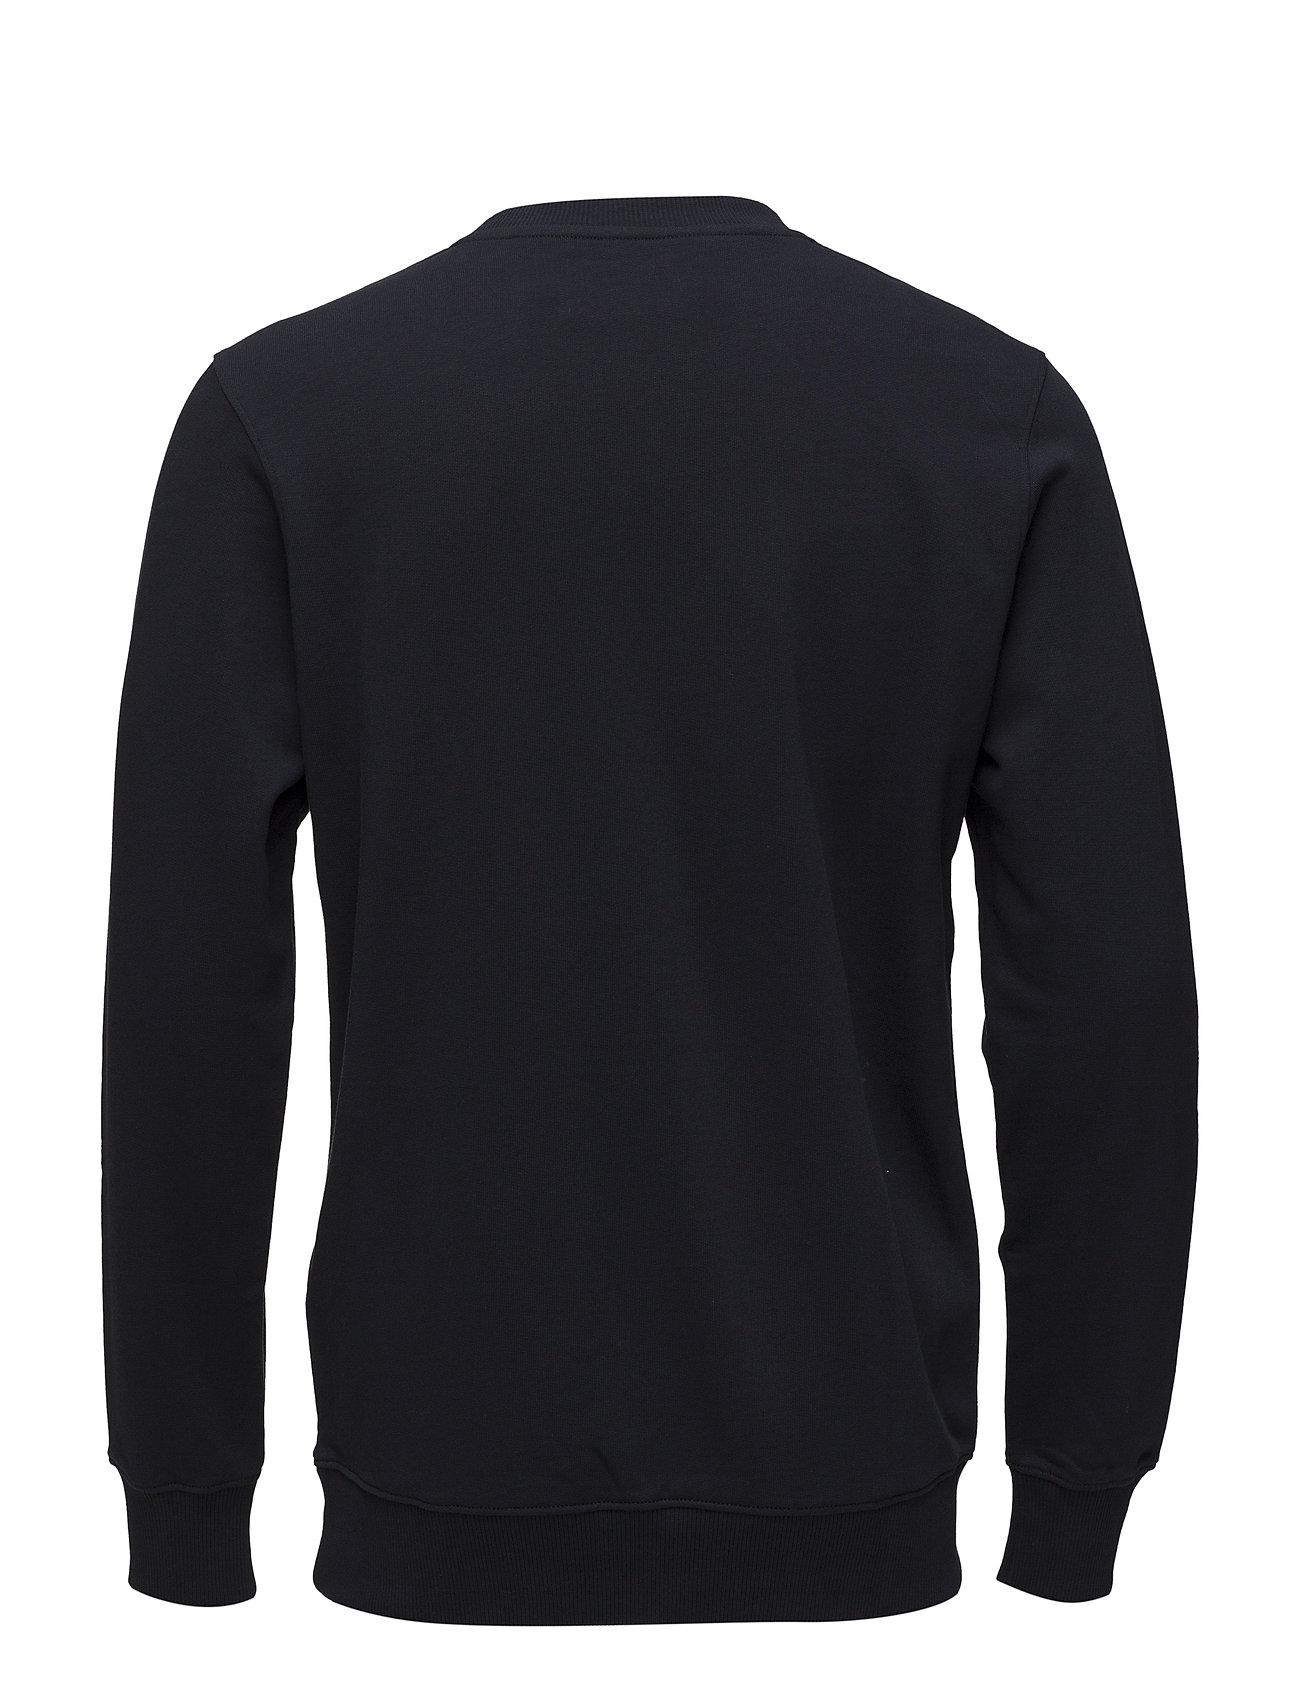 Jeans SkyLemonCalvin Institutional Klein Logo Sweatshirtnight OXkPZiu